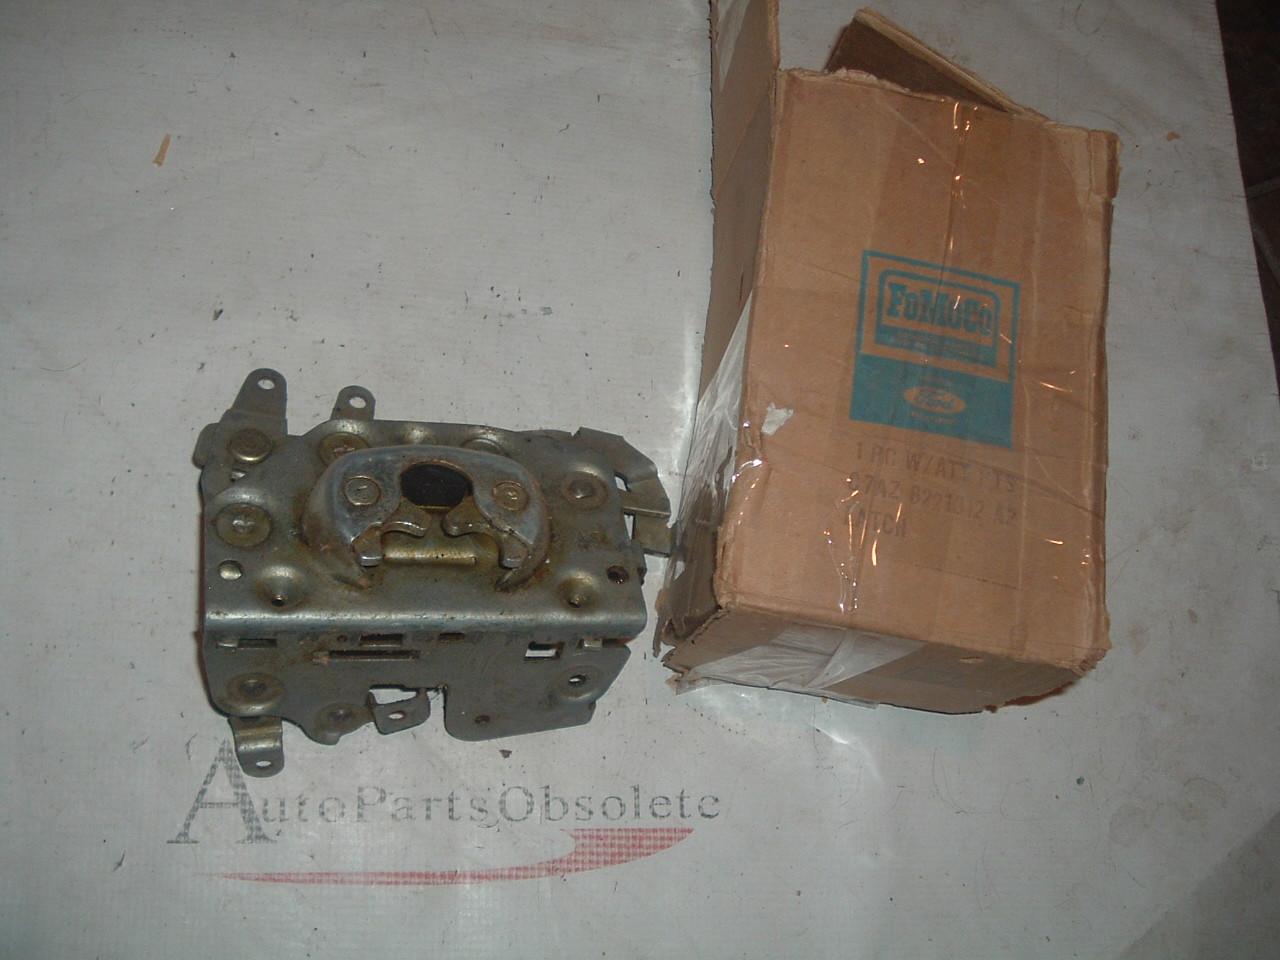 1967 Ford Galaxie door latch rh nos ford C7AZ-6221812-A2 (a c7az-6221812-a2)